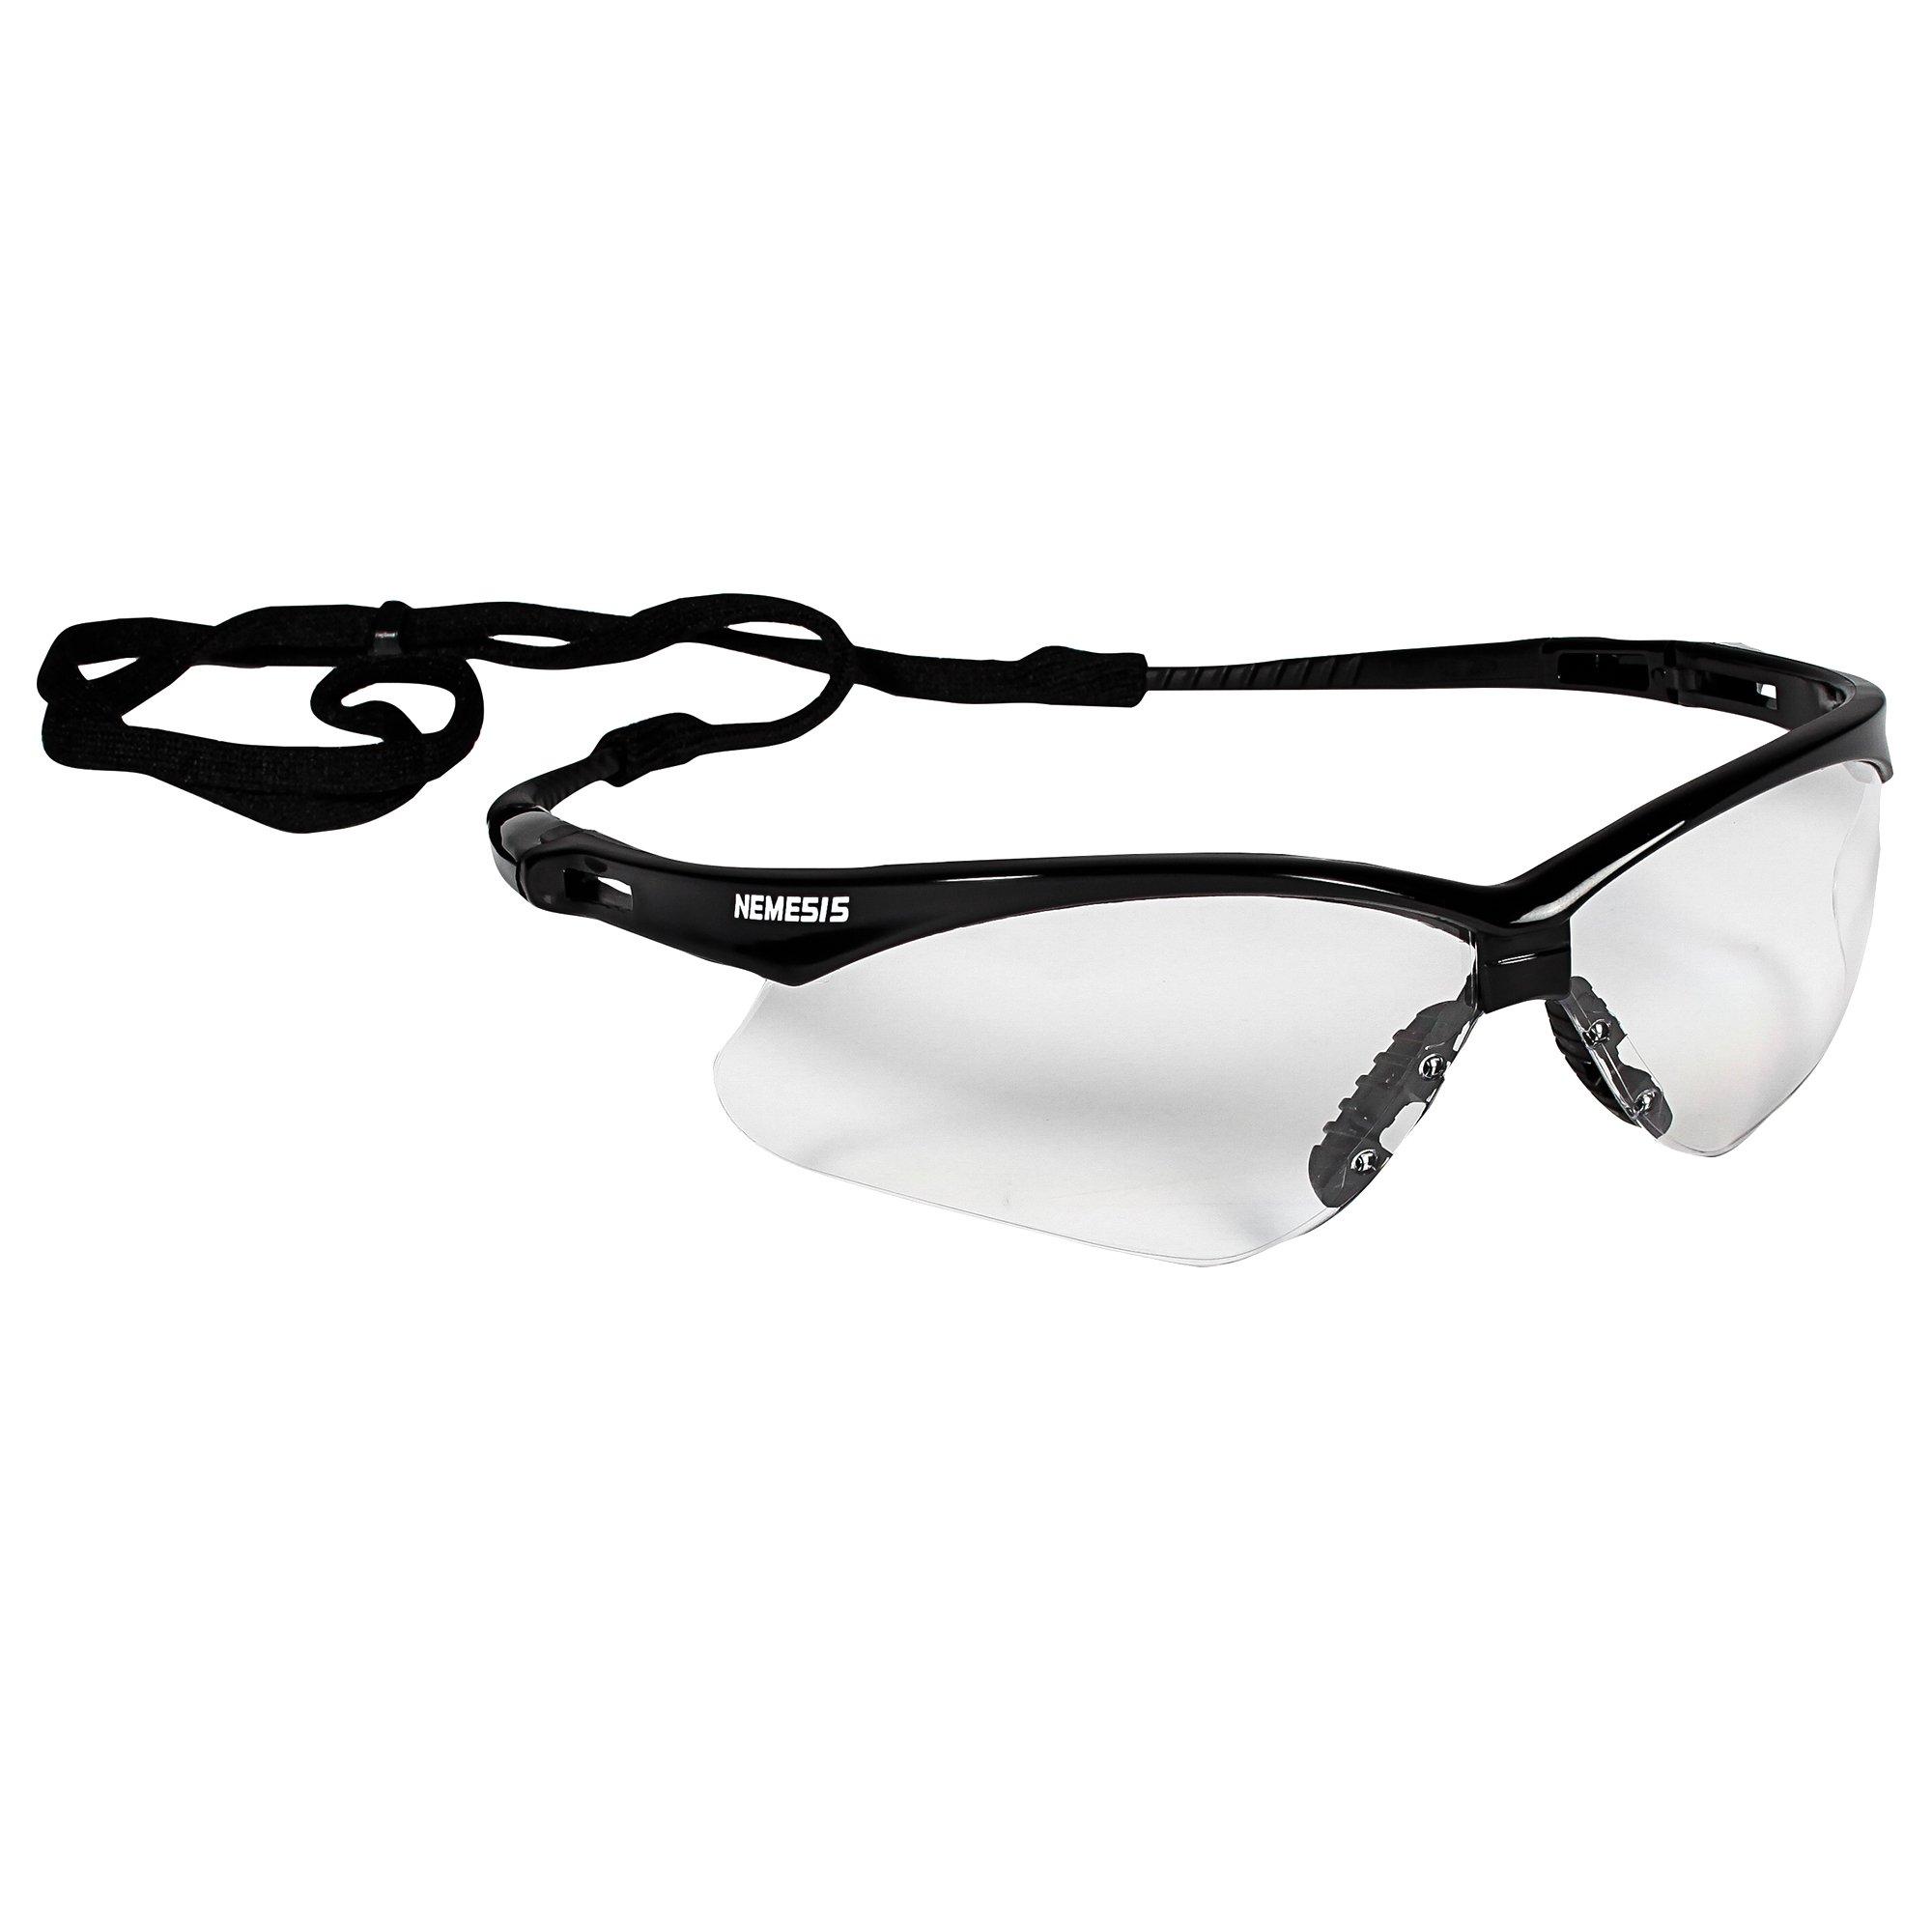 5a6b957fe0 Jackson Safety Nemesis Safety Glasses - TiendaMIA.com